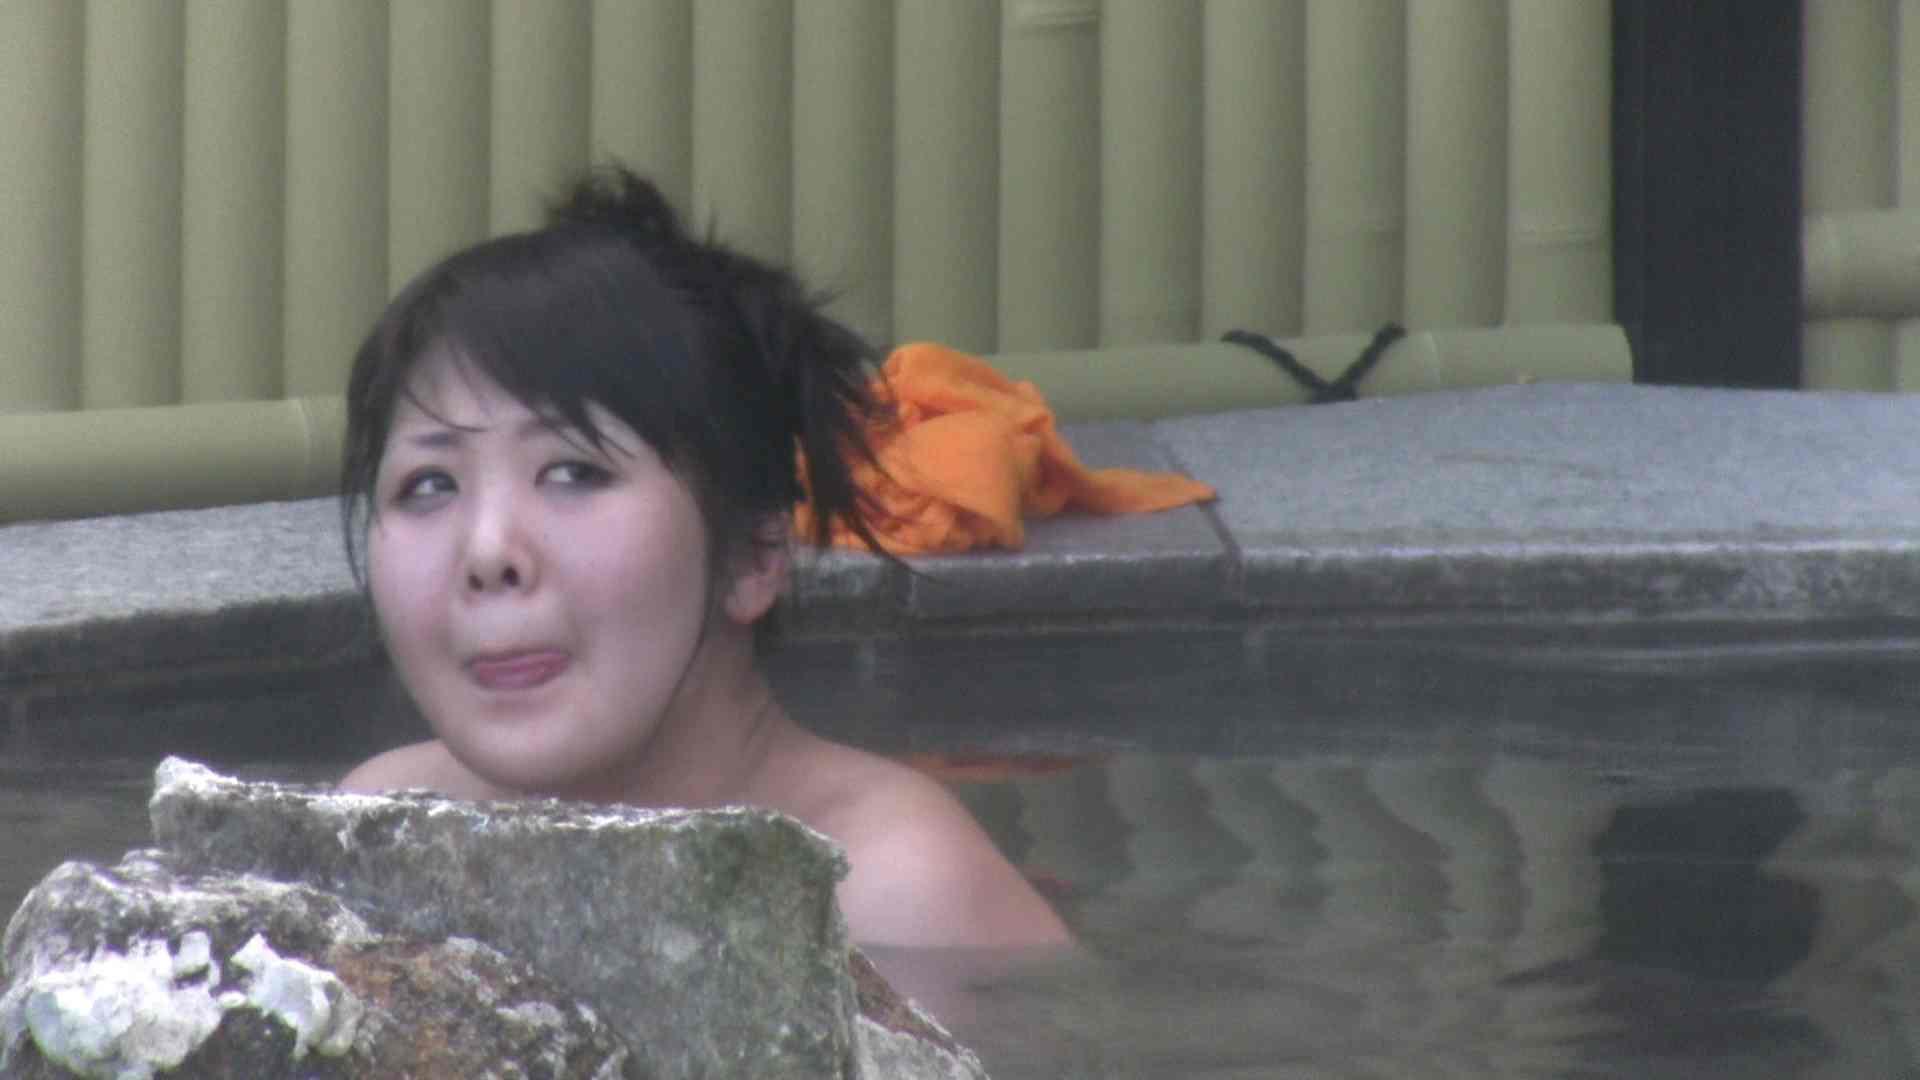 Aquaな露天風呂Vol.118 OL女体 | 露天  68連発 40